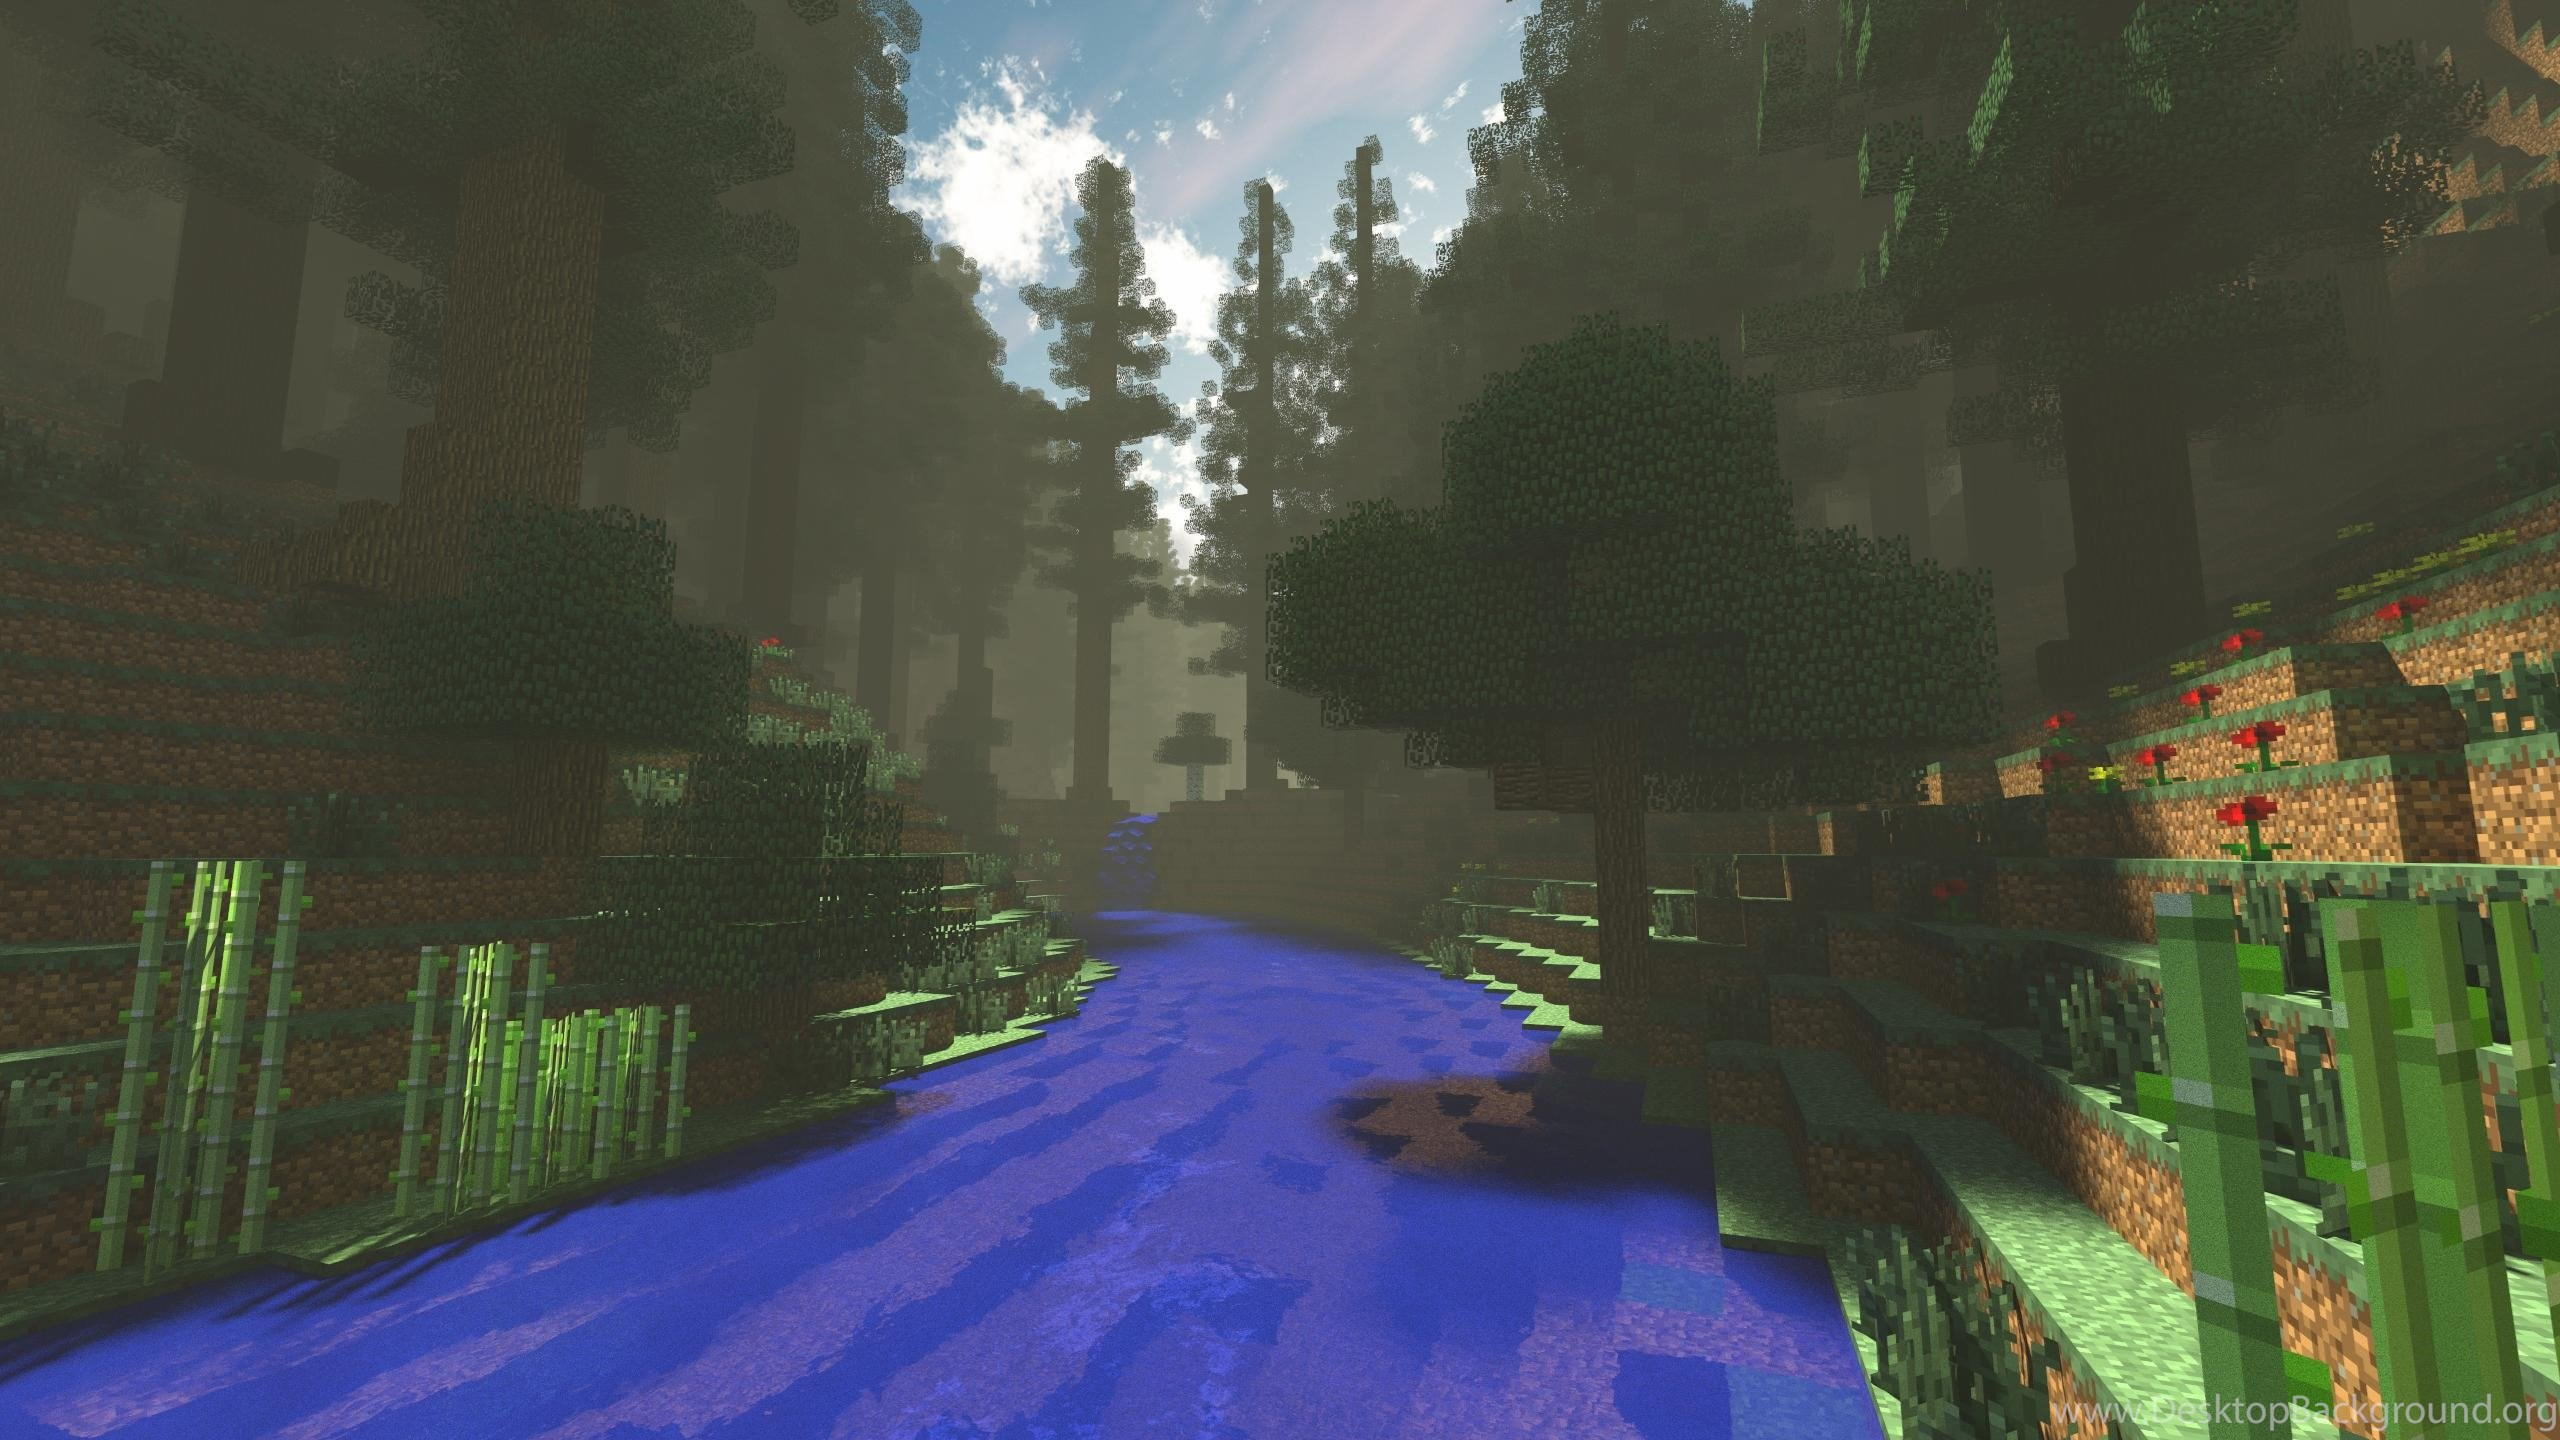 2560x1440 Minecraft Backgrounds Album On Imgur Desktop Background